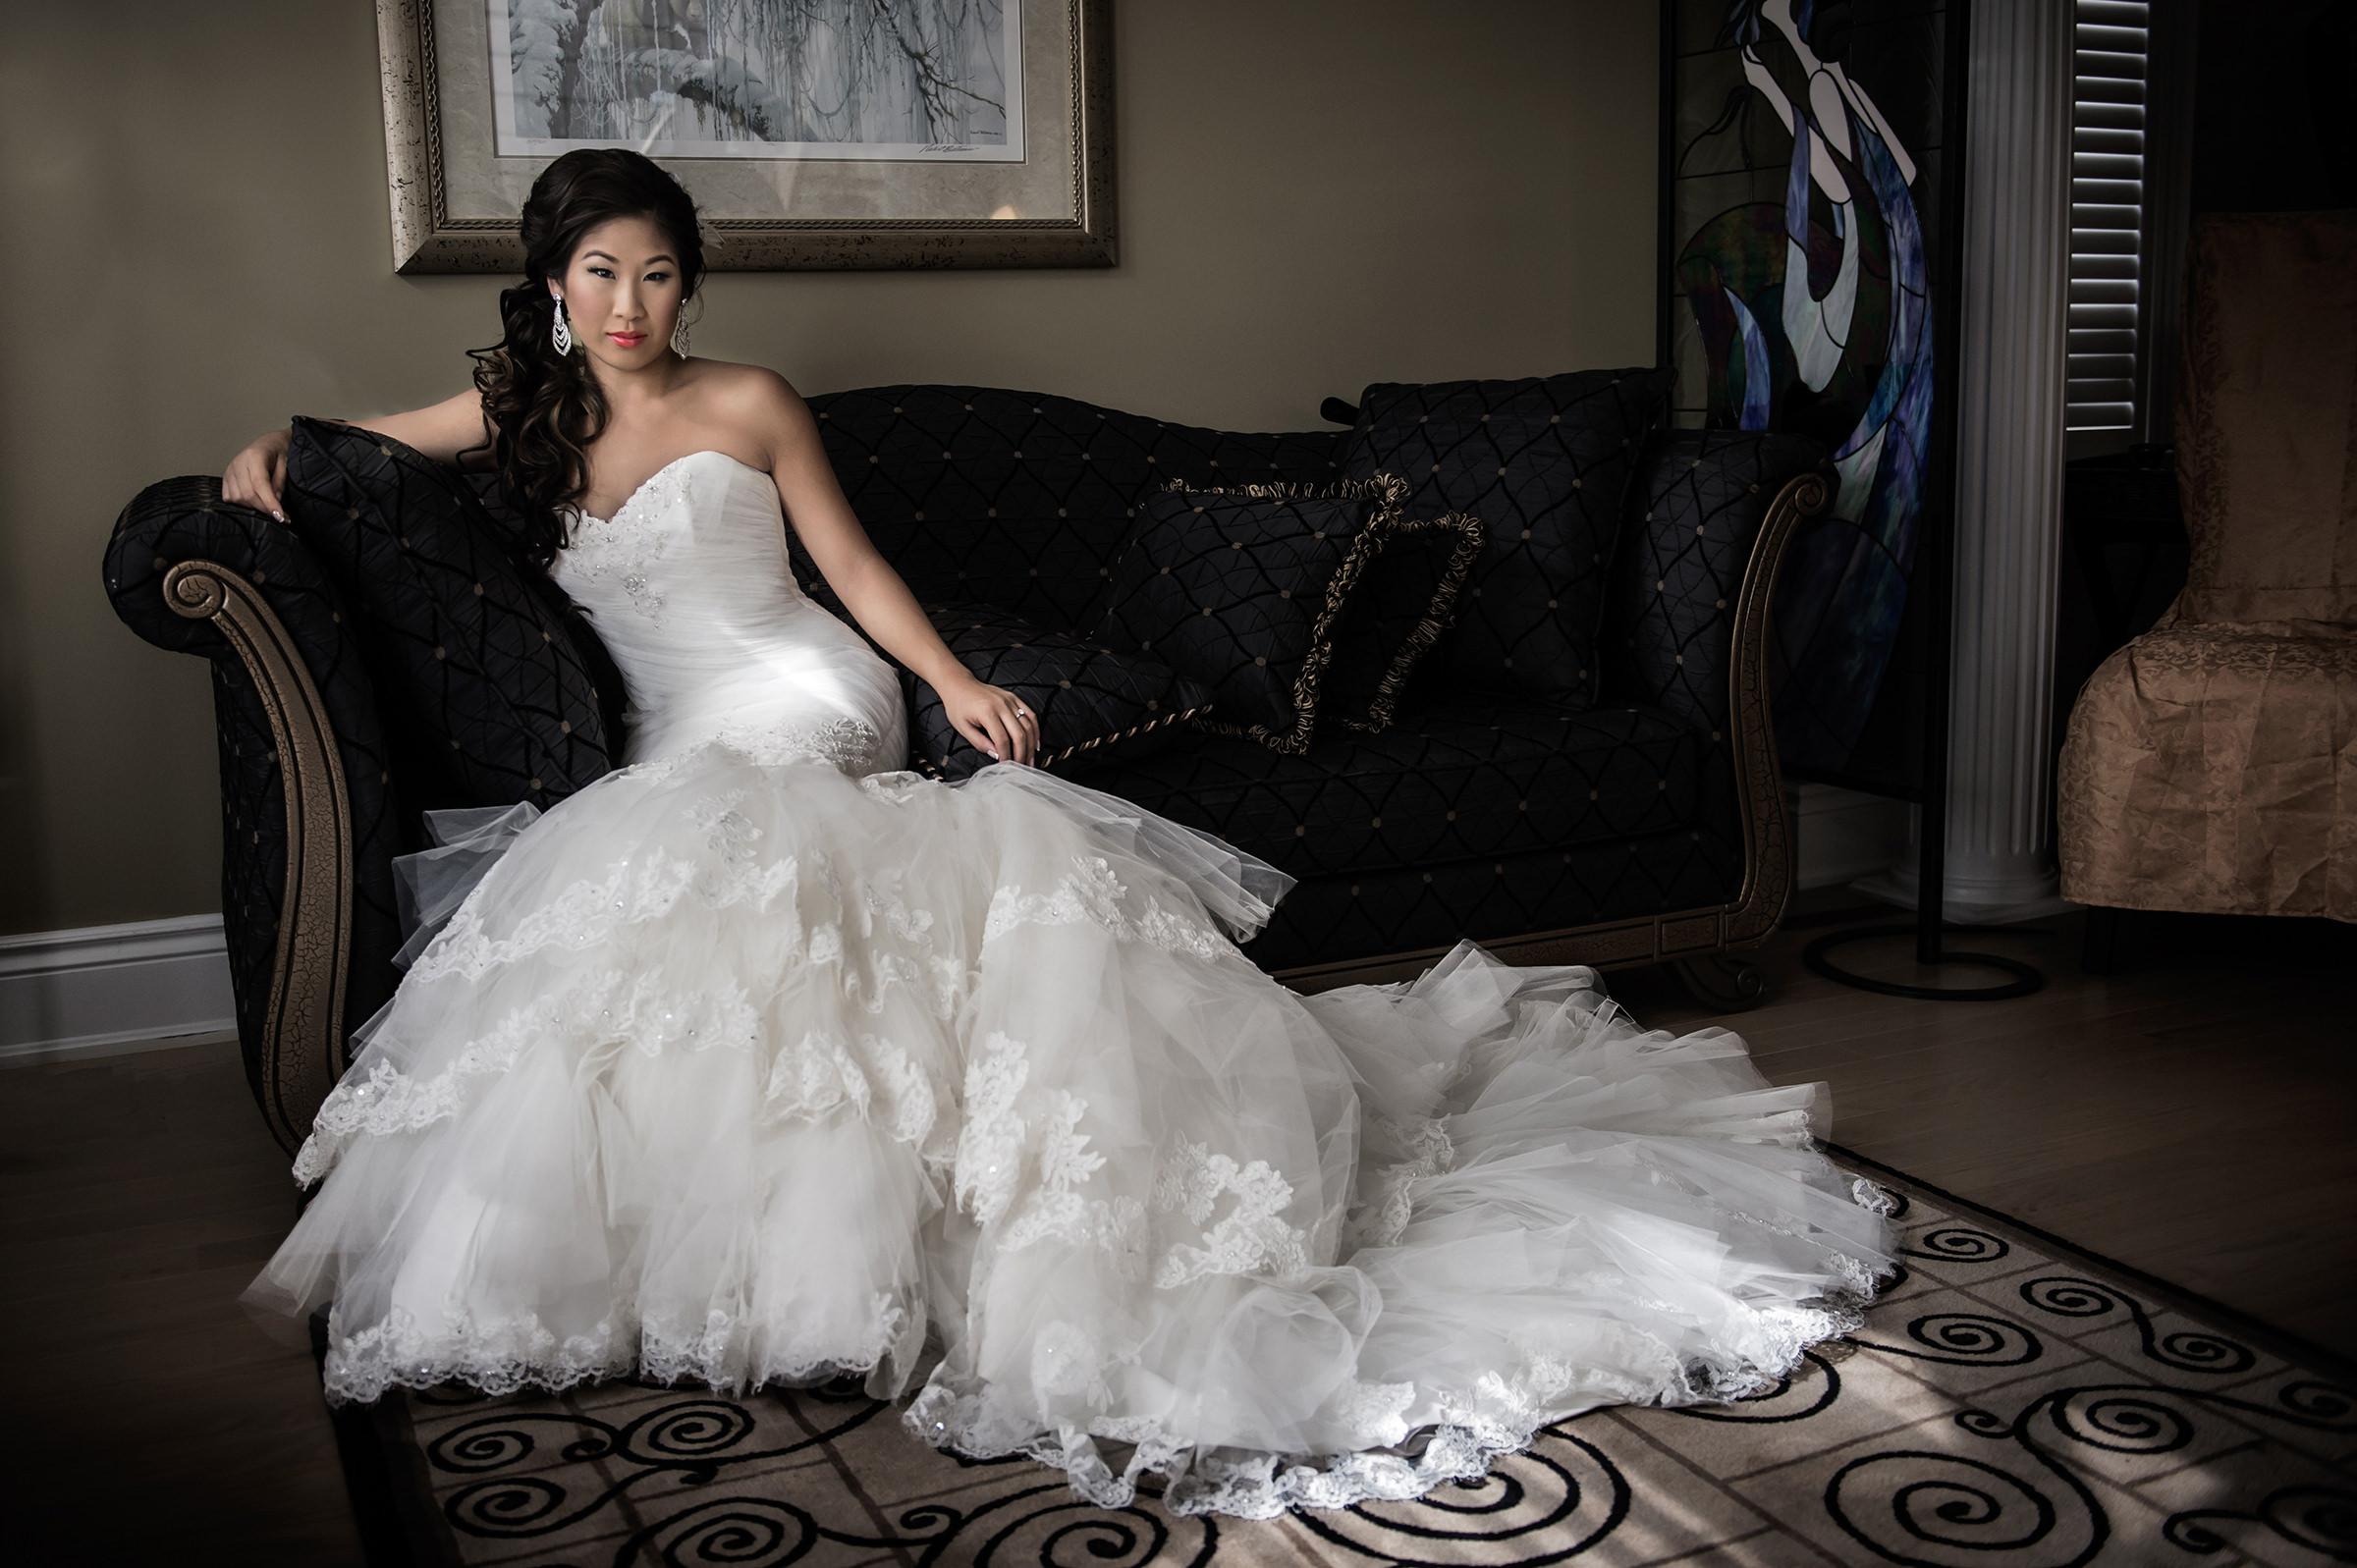 Bride posing on divan - photo by David & Sherry Photography